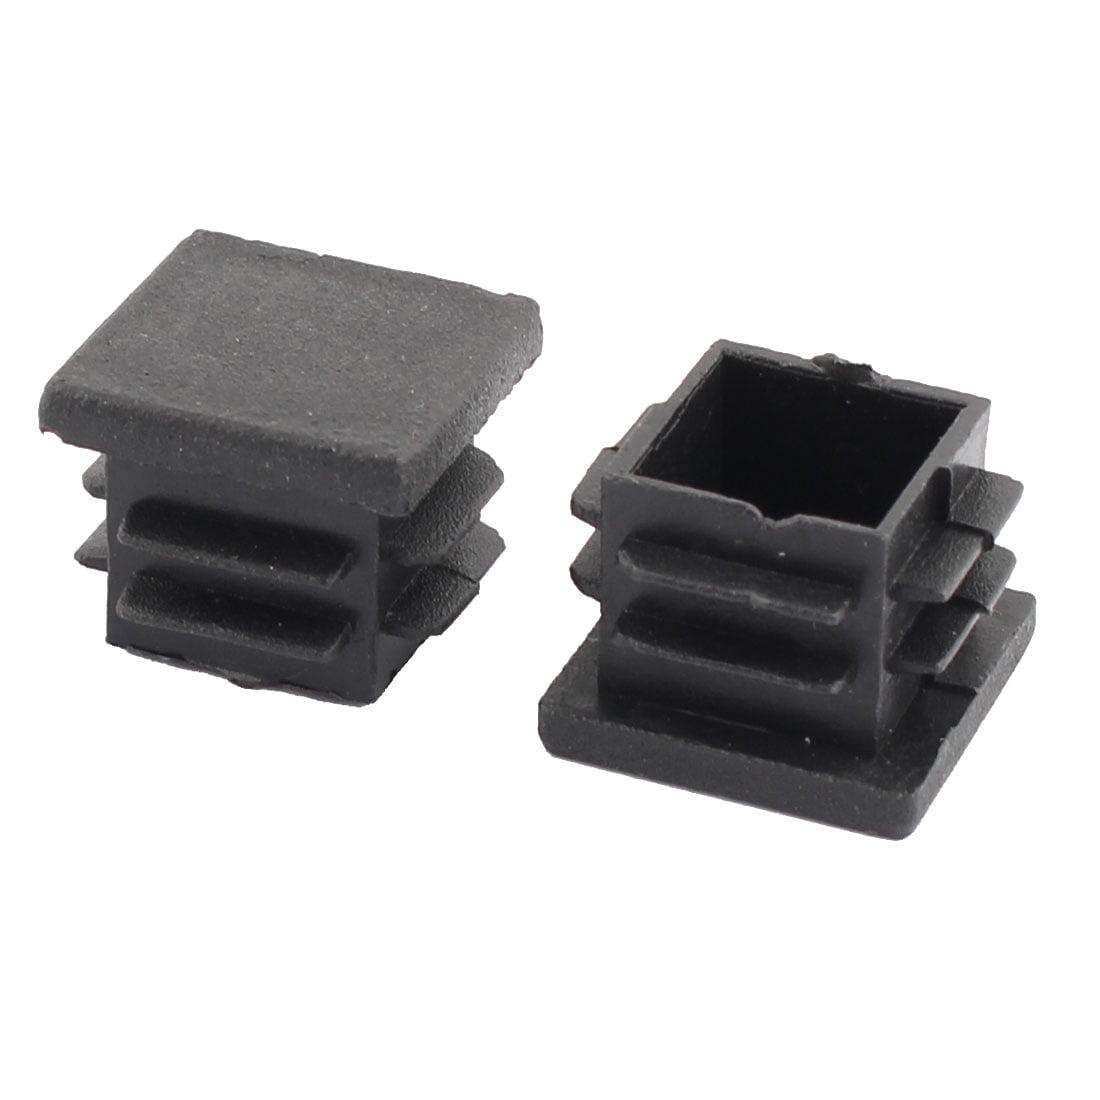 Home Plastic Square Table Cabinet Legs  Tube Insert Black 19 x 19mm 50 Pcs - image 1 of 2